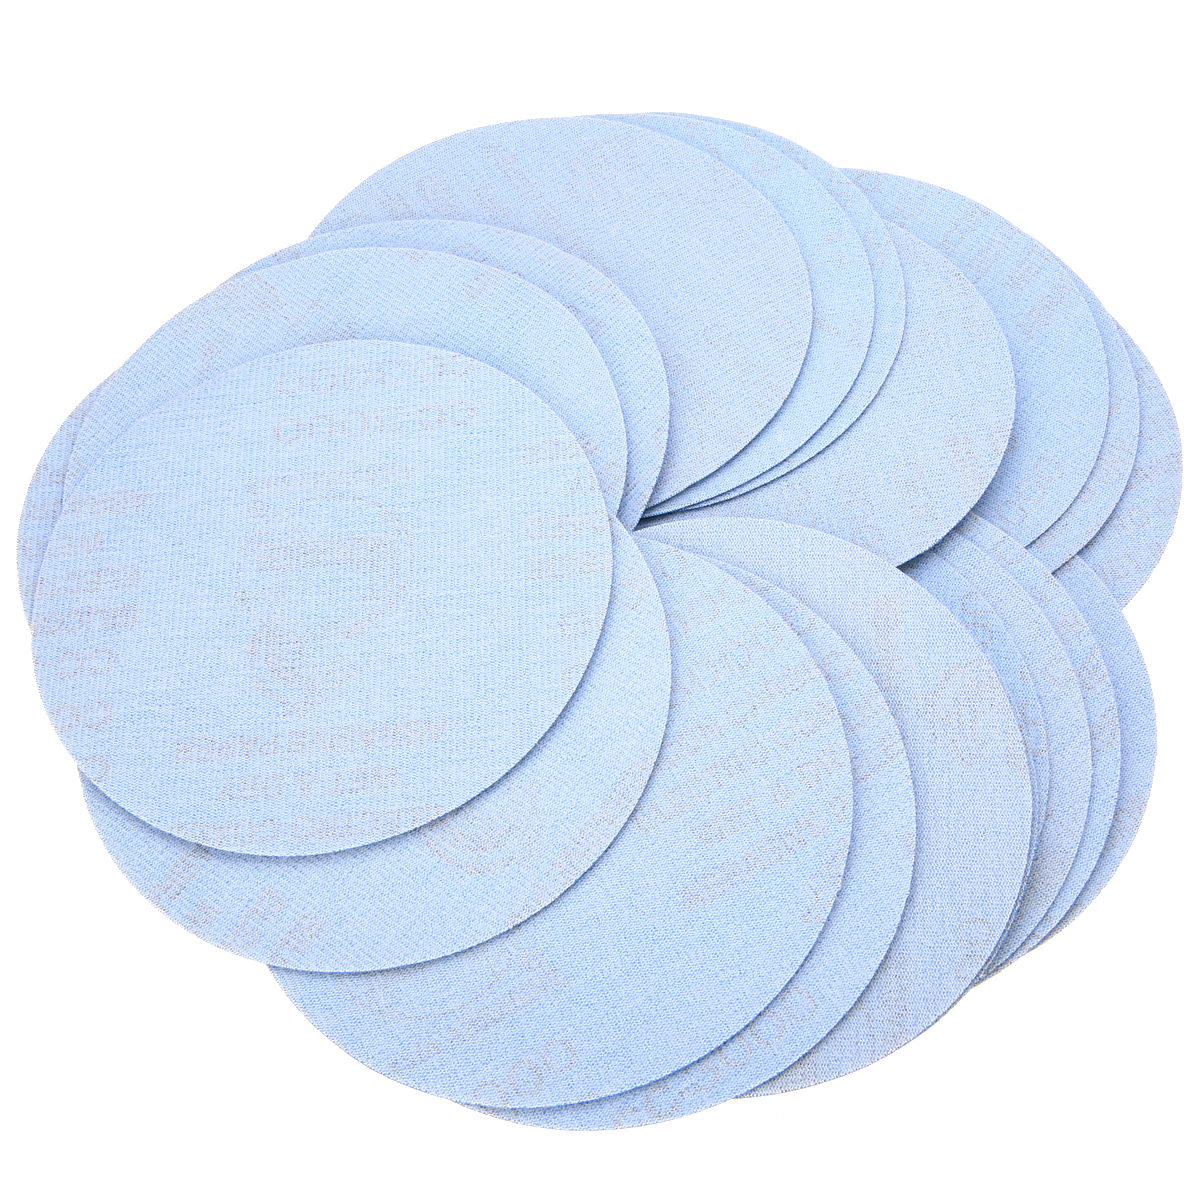 20Pcs 6 3000 Grit Sanding Discs Polishing Pad Sanding Paper Sheets for Abrasive Sanding Discs Tools20Pcs 6 3000 Grit Sanding Discs Polishing Pad Sanding Paper Sheets for Abrasive Sanding Discs Tools